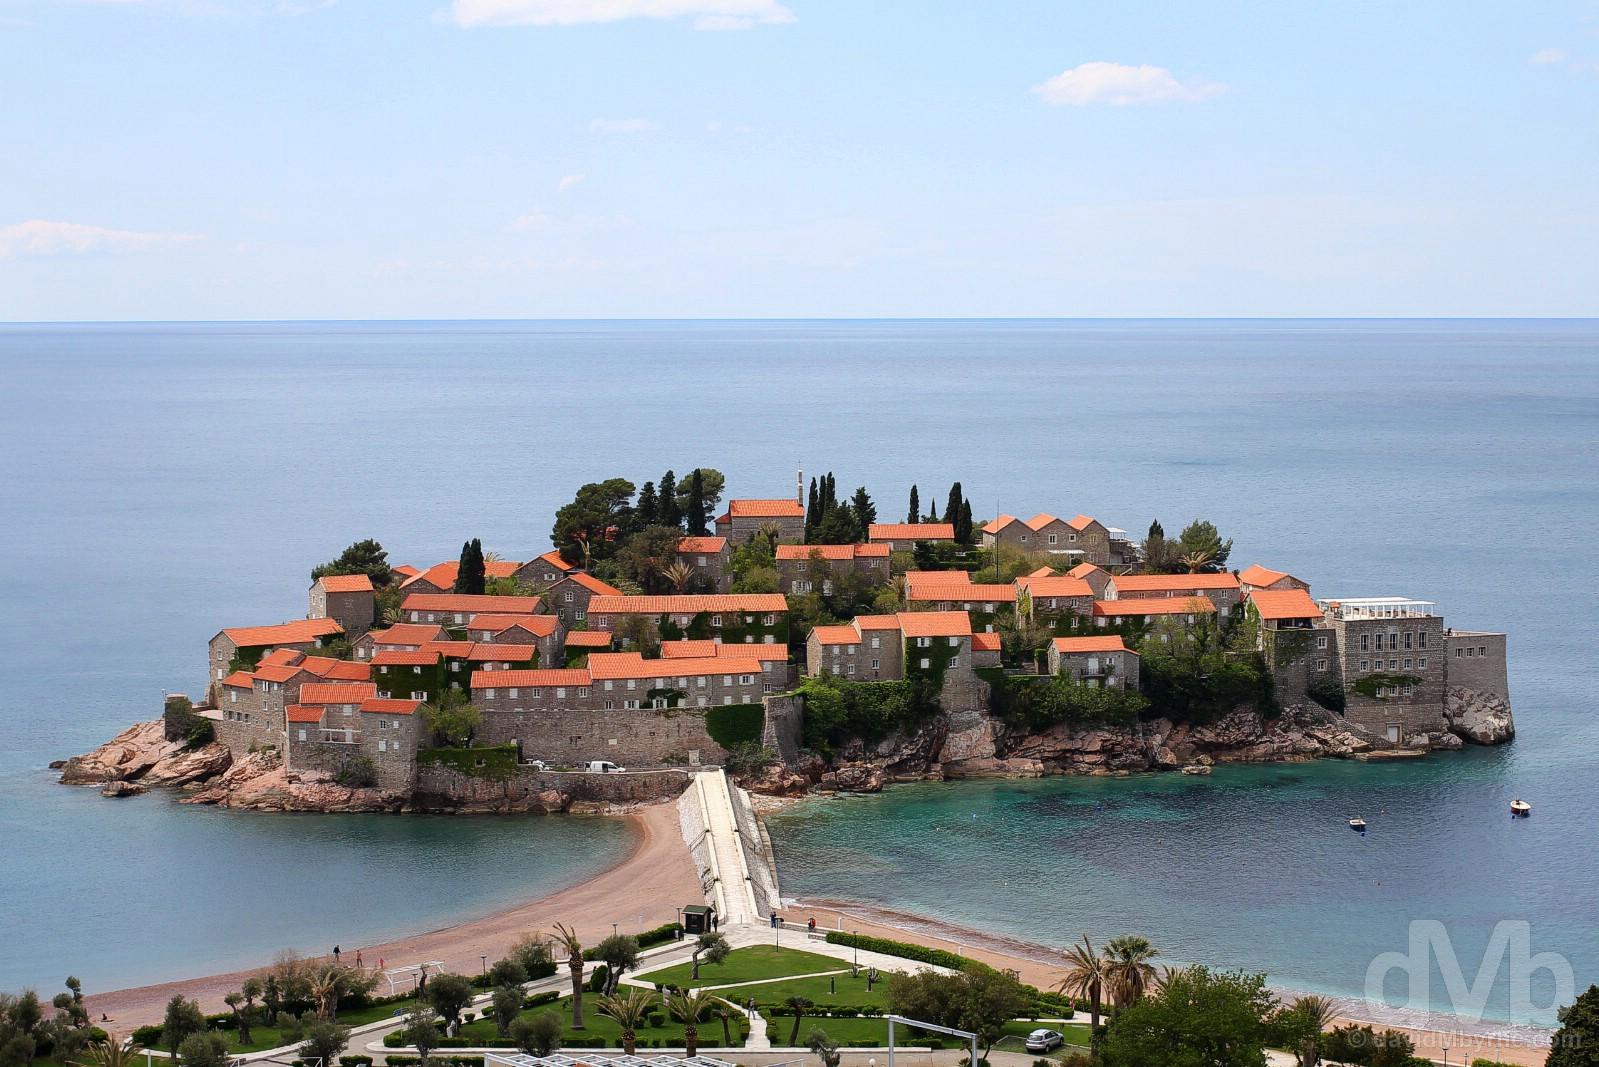 The uber-plush 5-star fortress resort island of Sveti Stefan as seen from the coastal-hugging E80, Budvanska Rivijera, Montenegro. April 21, 2017.